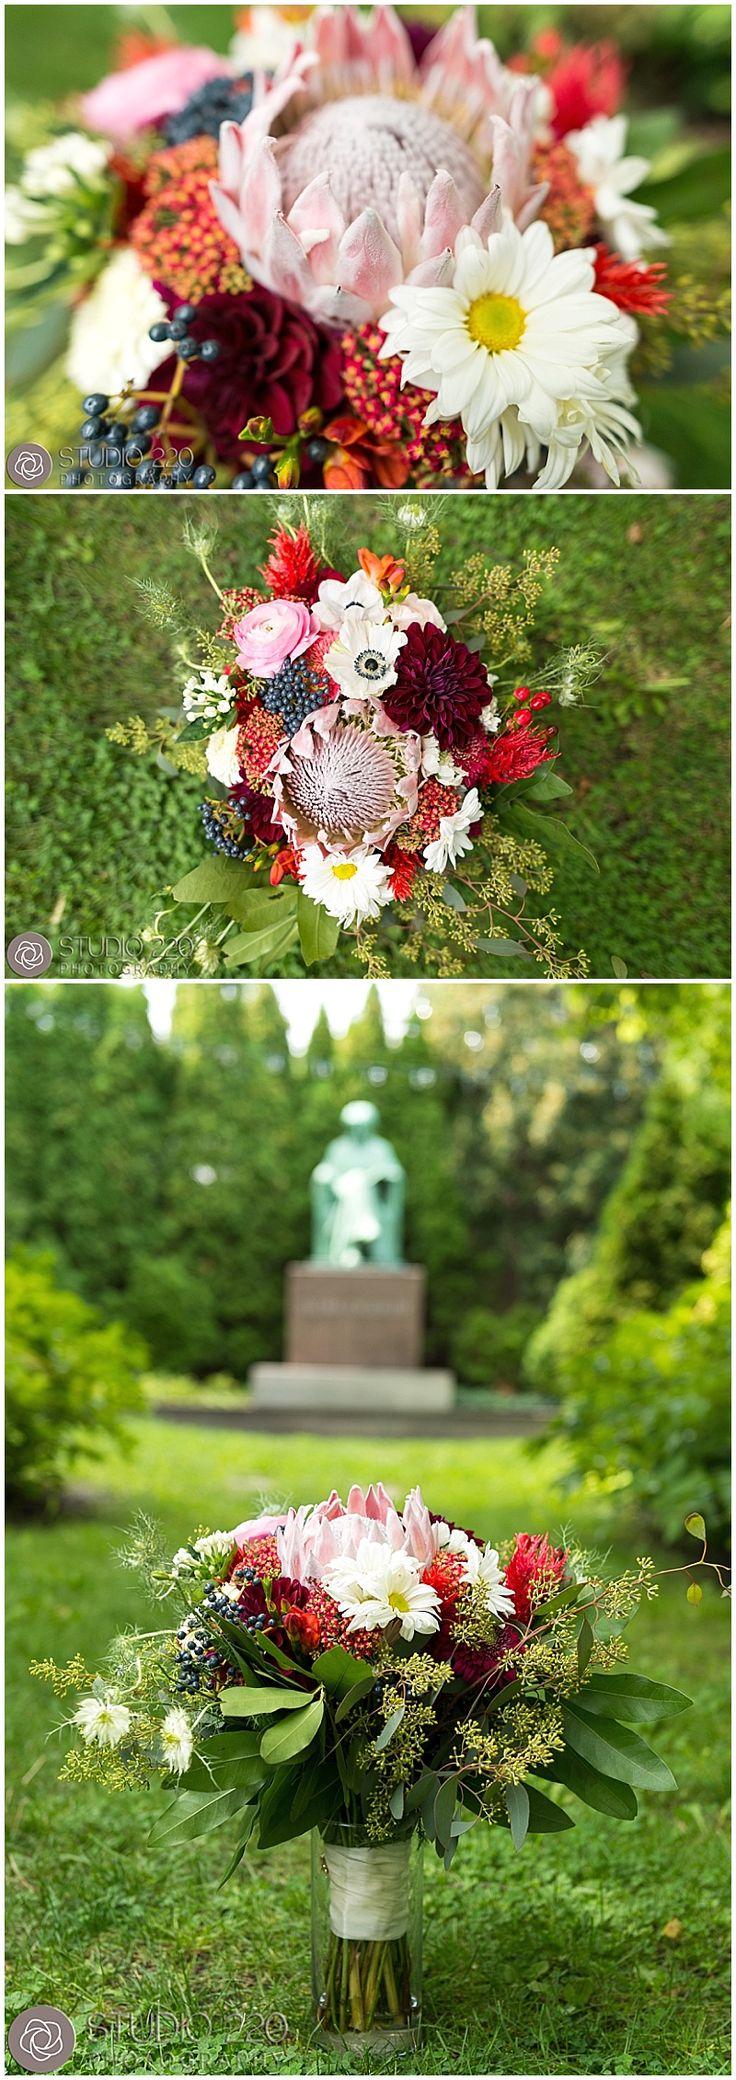 Inside the bouquet: Queen proteas, coxcombs, dahlias, ranunculus, zinnias, anemones, privets, bay leaf, seeded eucalyptus, bouvardias, mums, magnolias, feather celosias, scabiosas, hypericum, and freesia. Designed by Minneapolis wedding florist Artemisia Studios. Photos by Studio 220 (https://www.studio220photography.com/) #bridalbouquet #flowers #floral #wedding #Bouquet #minneapolisweddingflorist #artemisiastudios